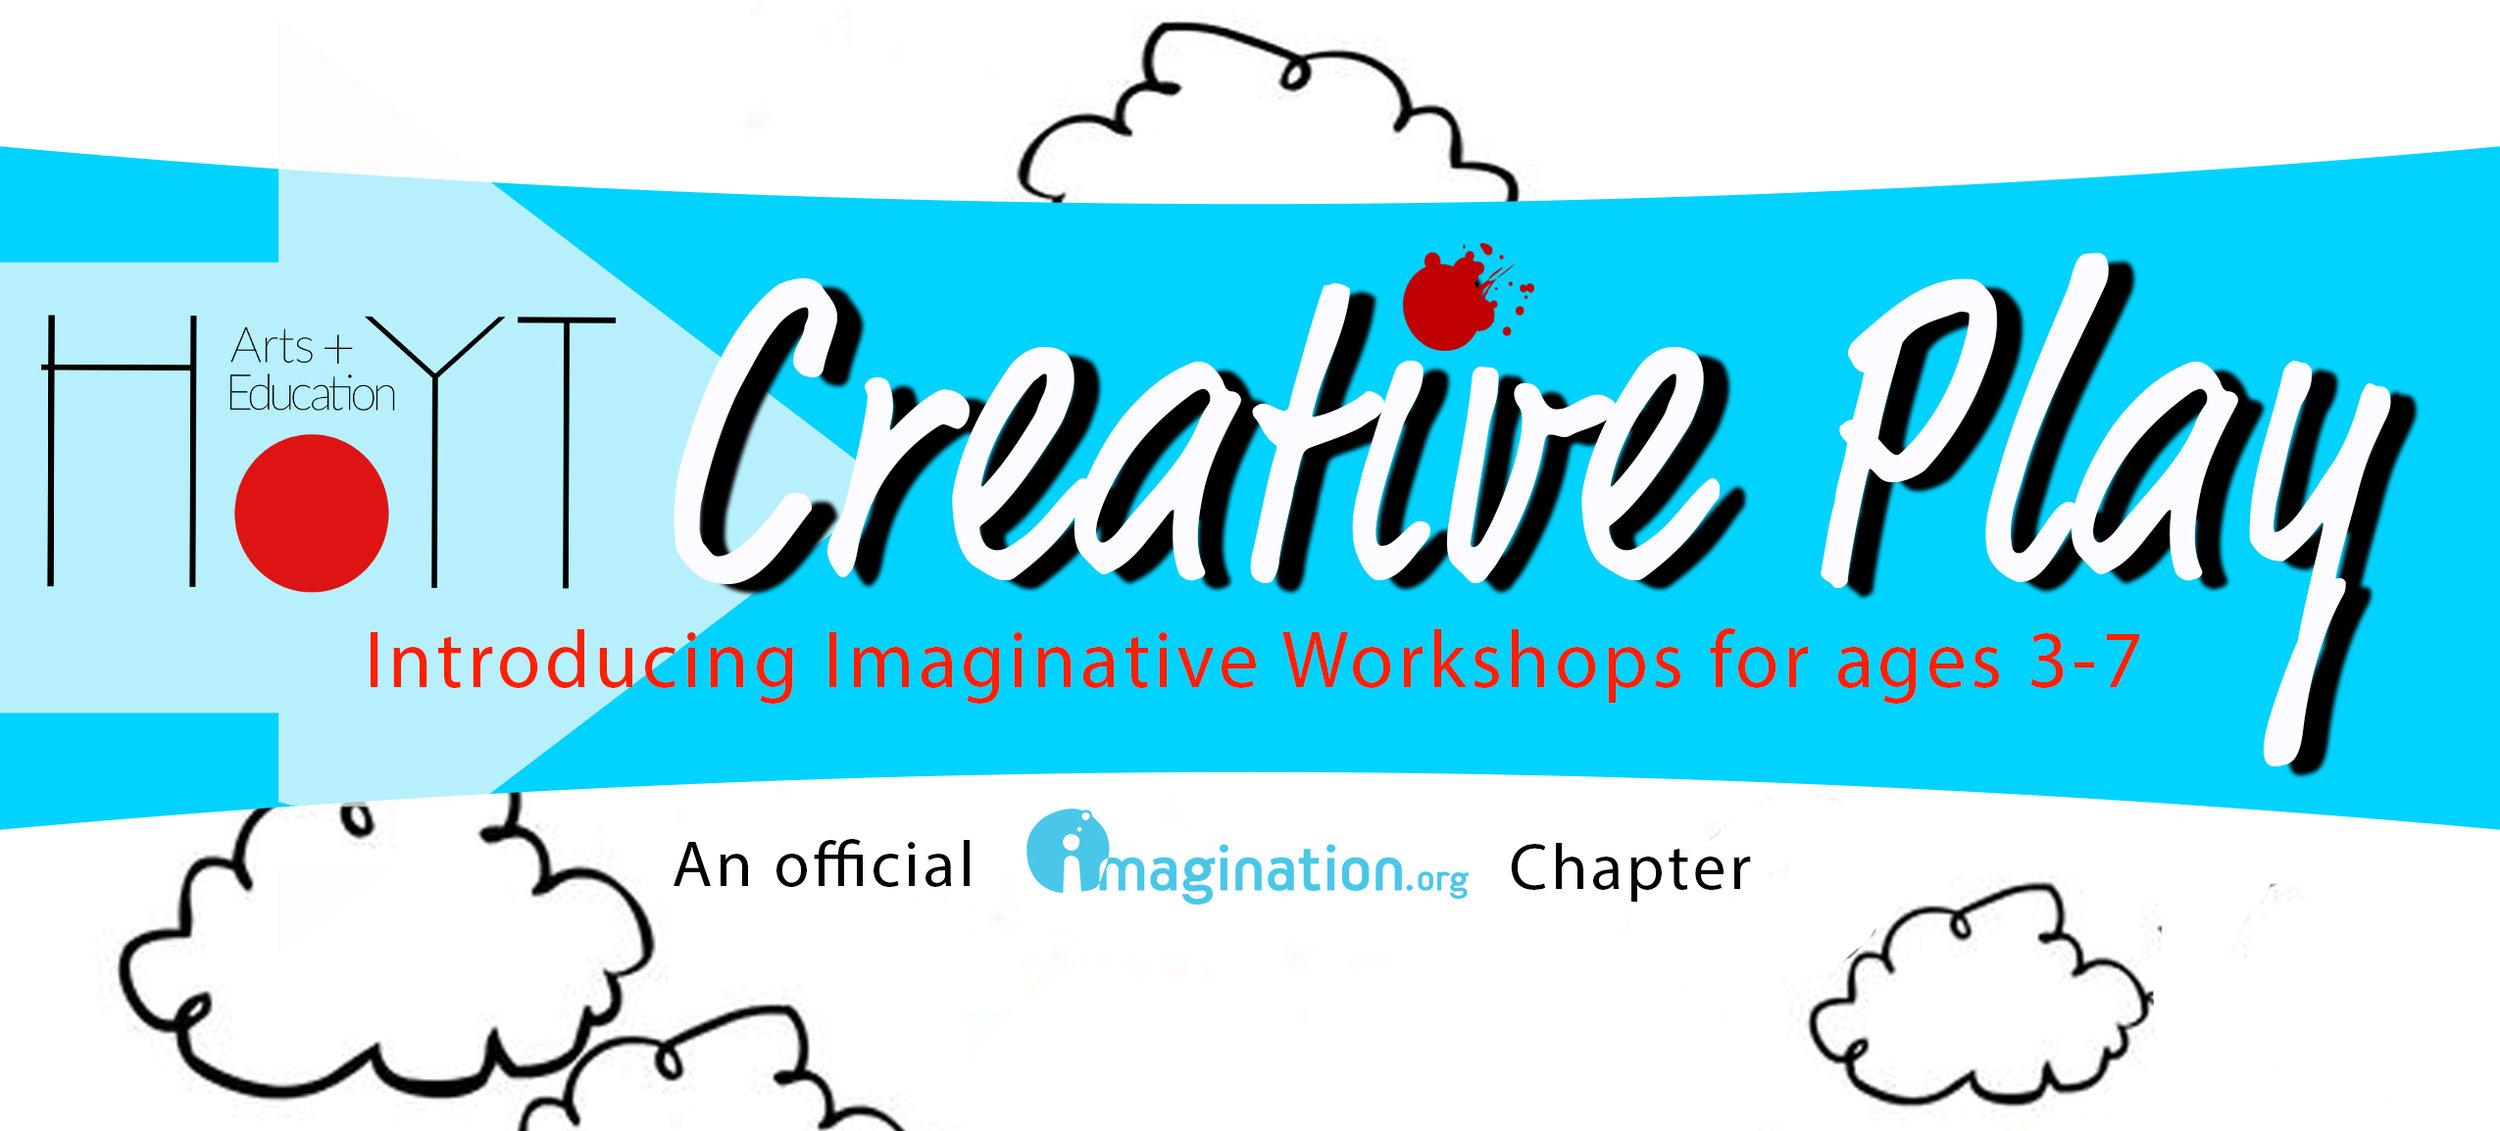 Creative Play header.jpg